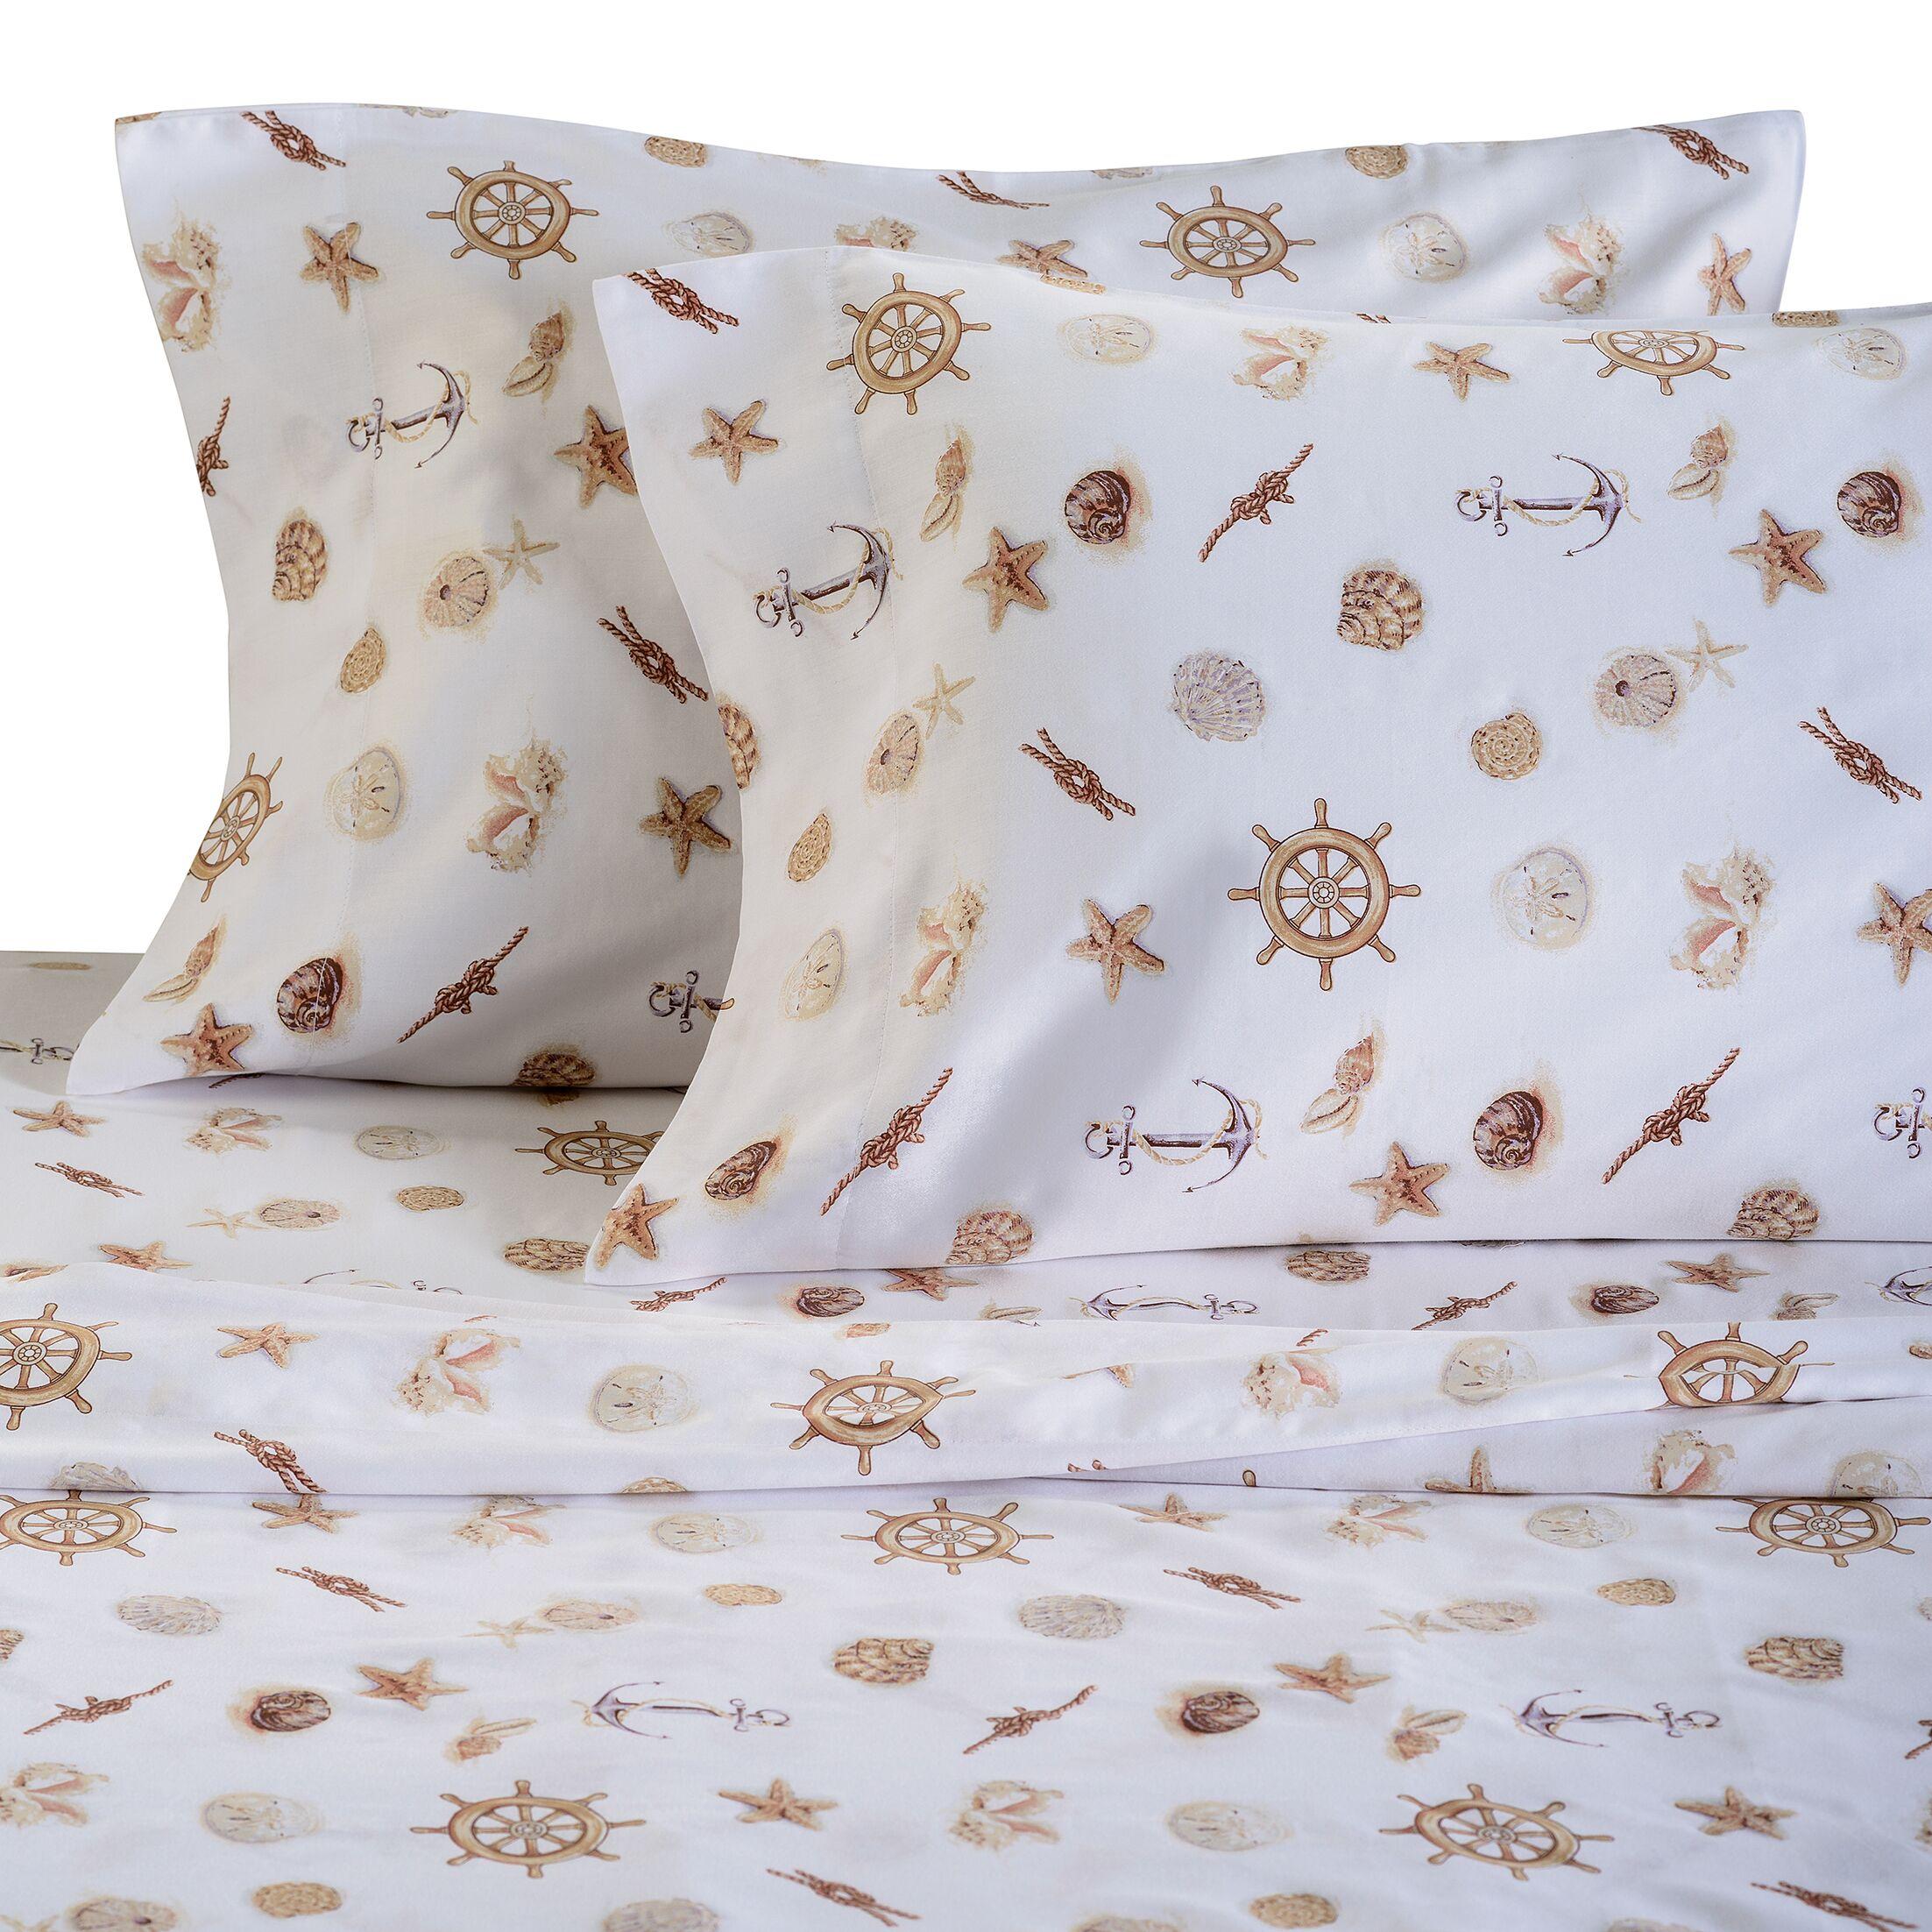 Nautical 300 Thread Count Cotton Sheet Set Size: King, Color: Neutral